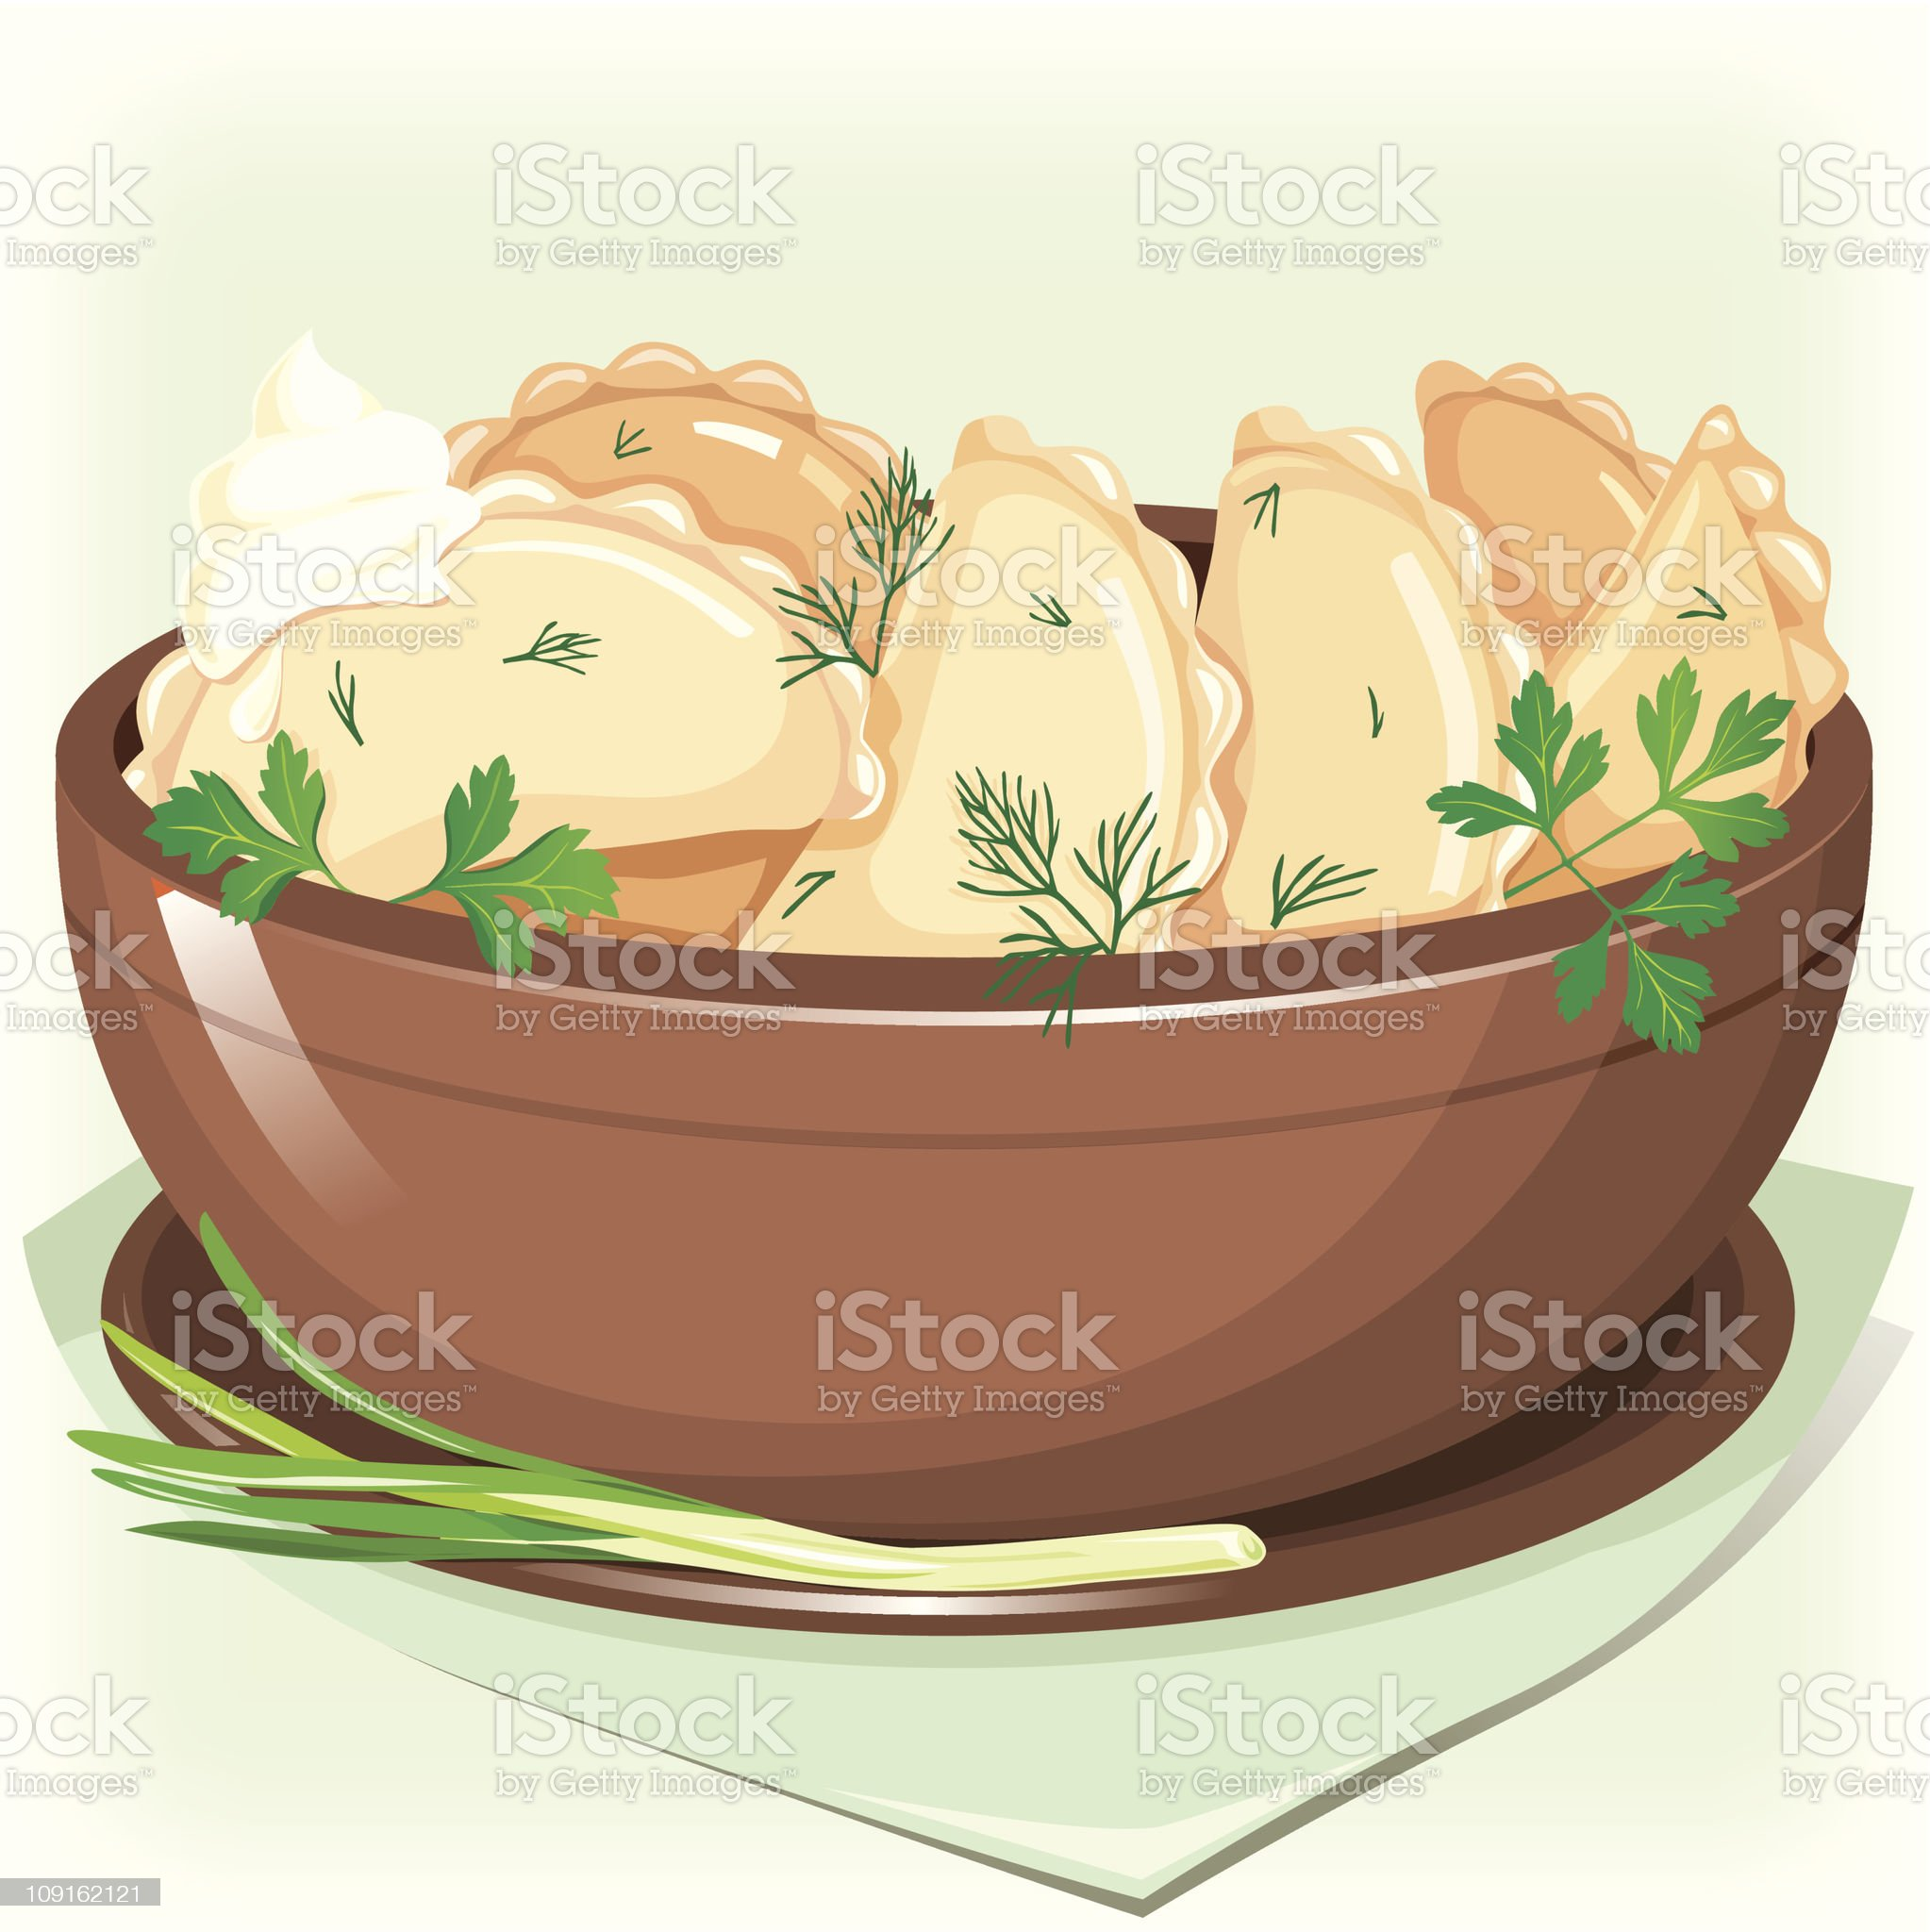 Dumpling sifting greens royalty-free stock vector art